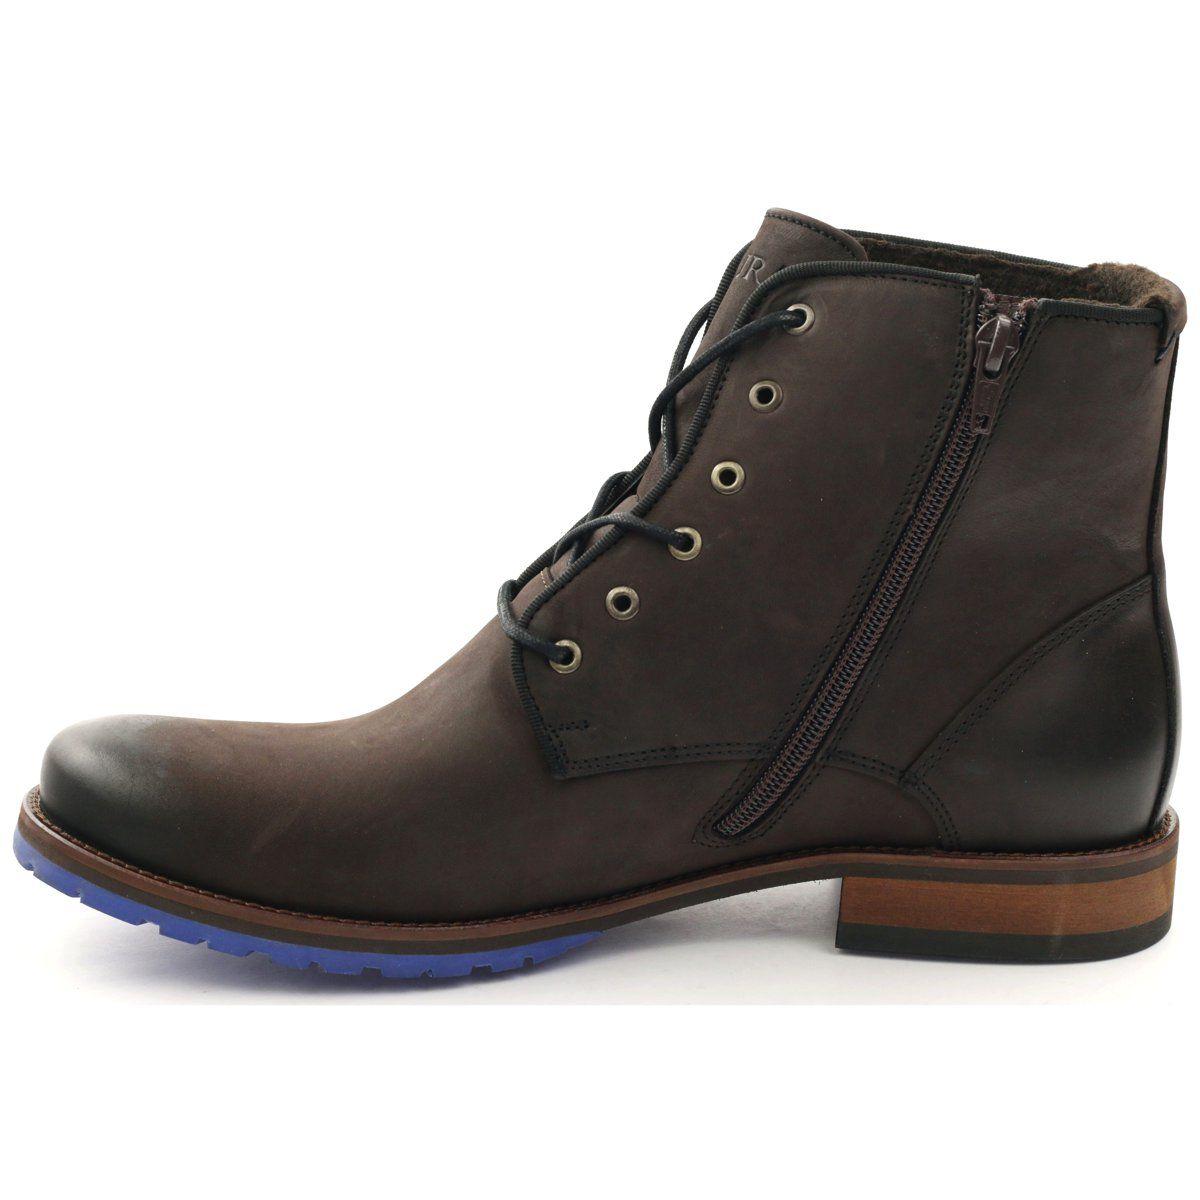 Trzewiki Botki Badura 4559 Brazowe Shoes Boots Combat Boots